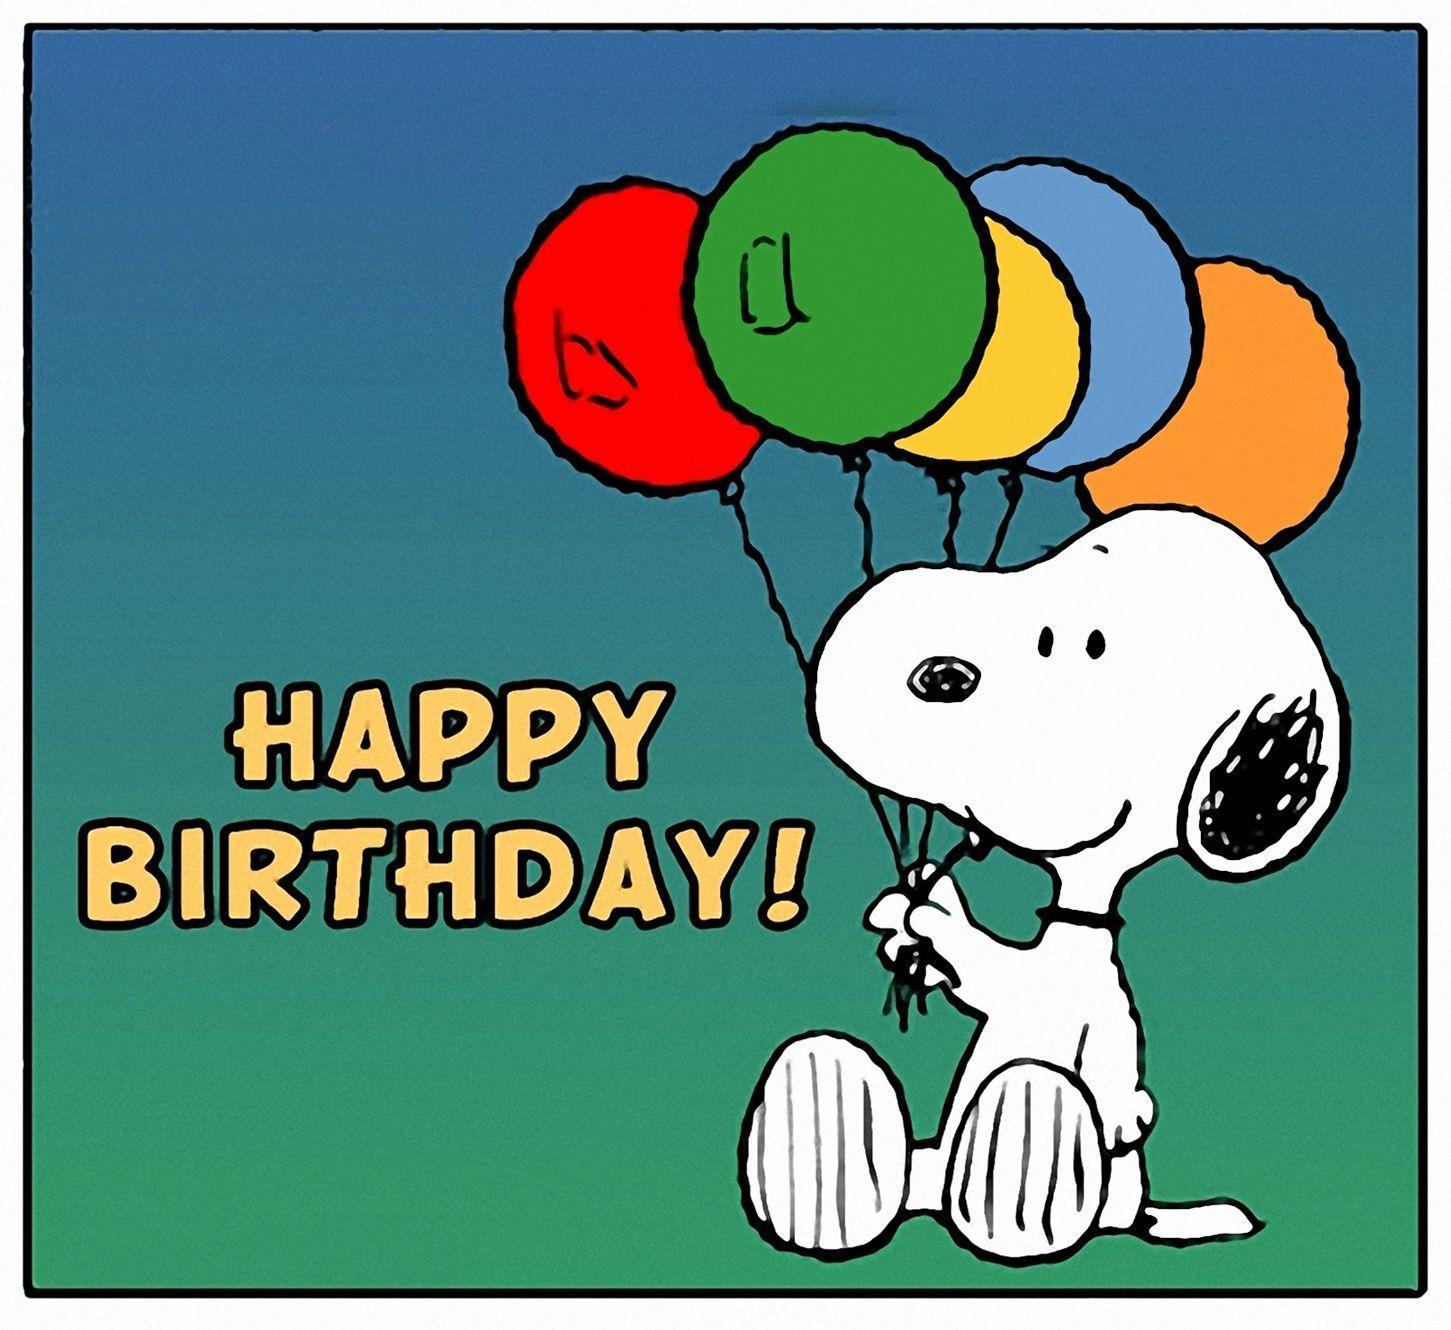 Charlie Brown Birthday Wallpapers Top Free Charlie Brown Birthday Backgrounds Wallpaperaccess